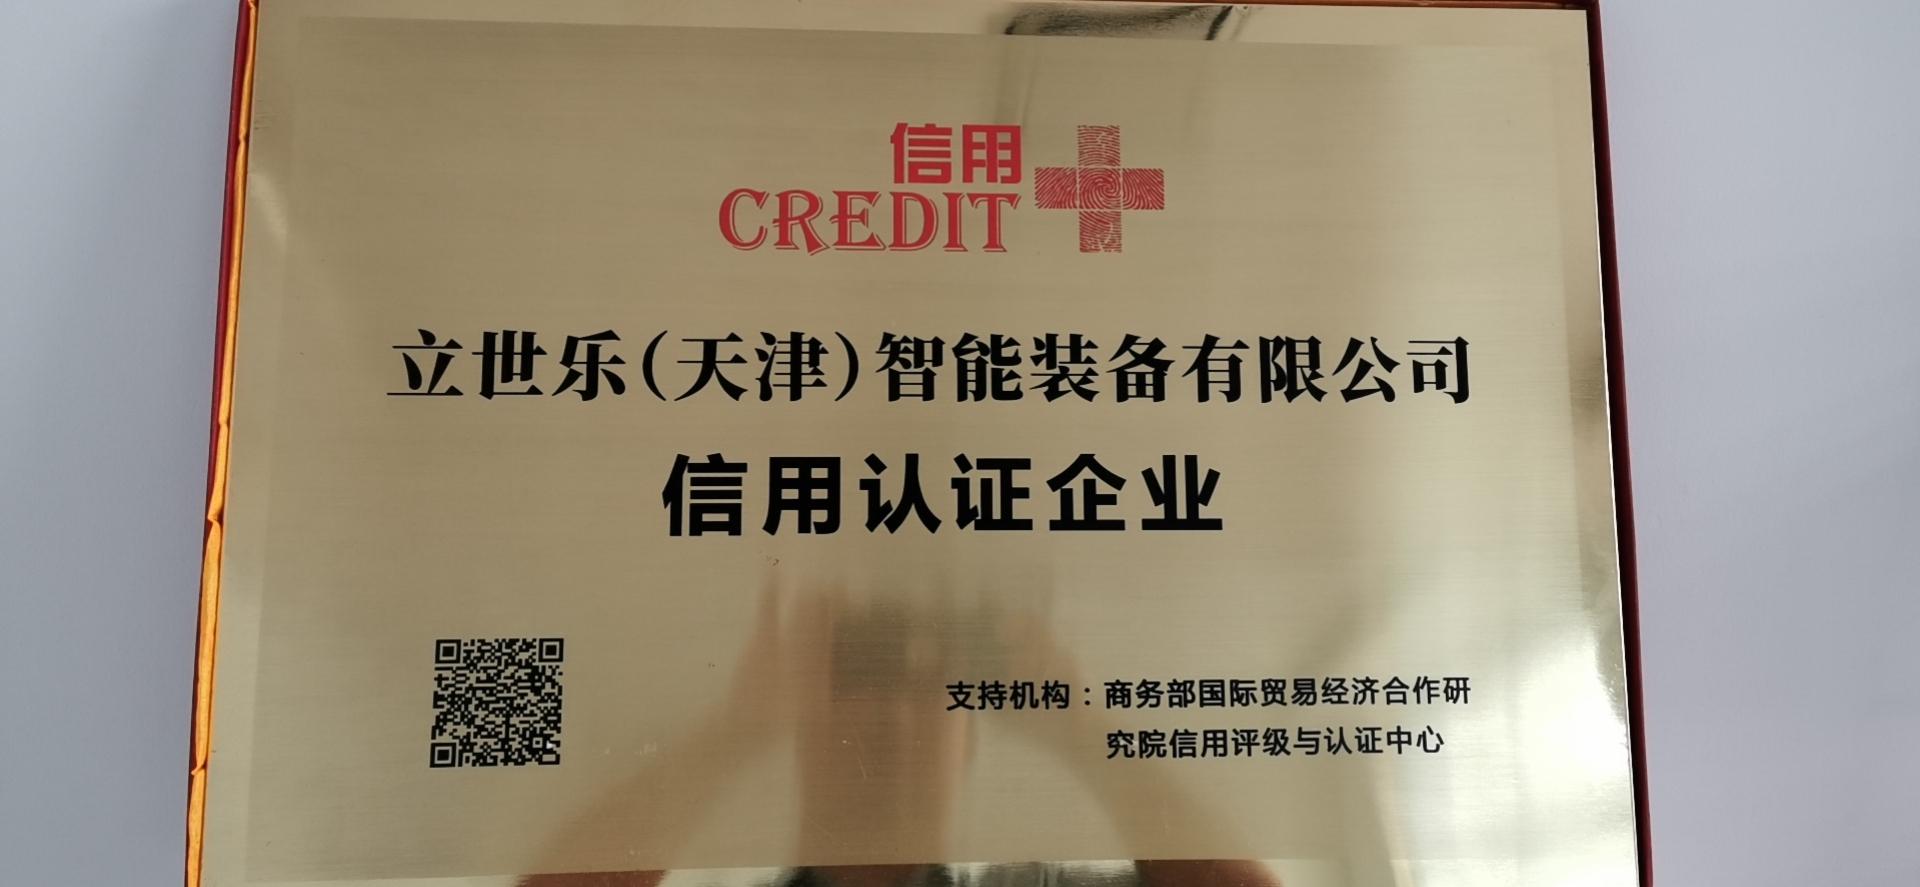 Gambar WeChat_20200818093858.jpg